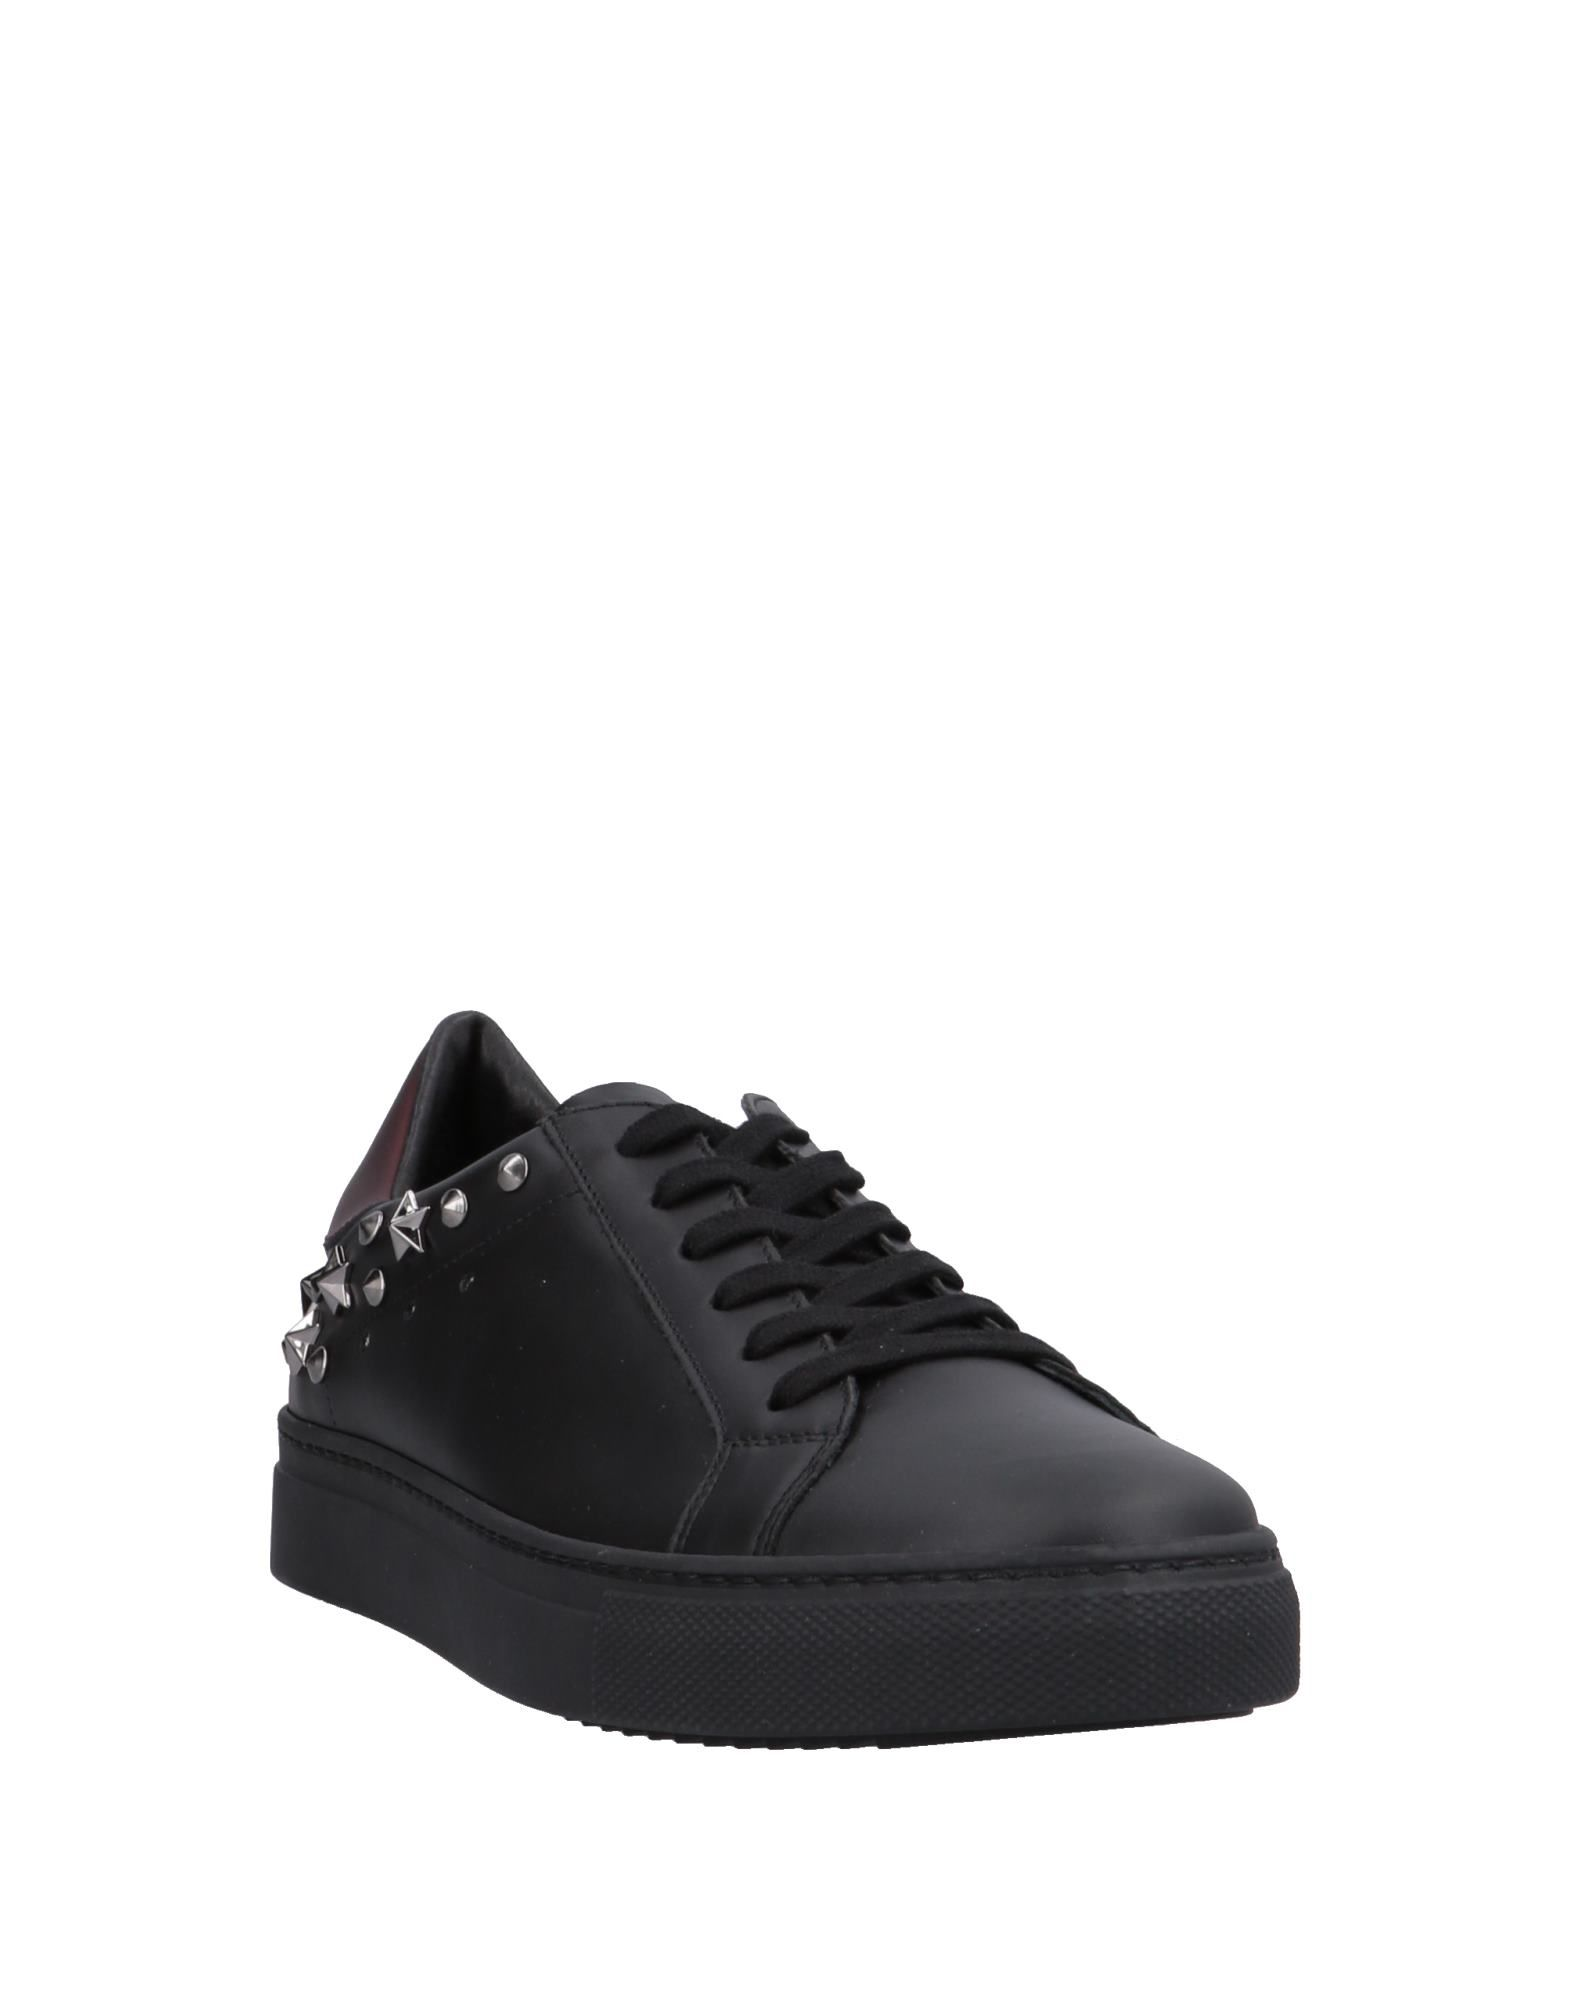 Rabatt echte  Schuhe Stokton Sneakers Herren  echte 11562110GV f3fe61